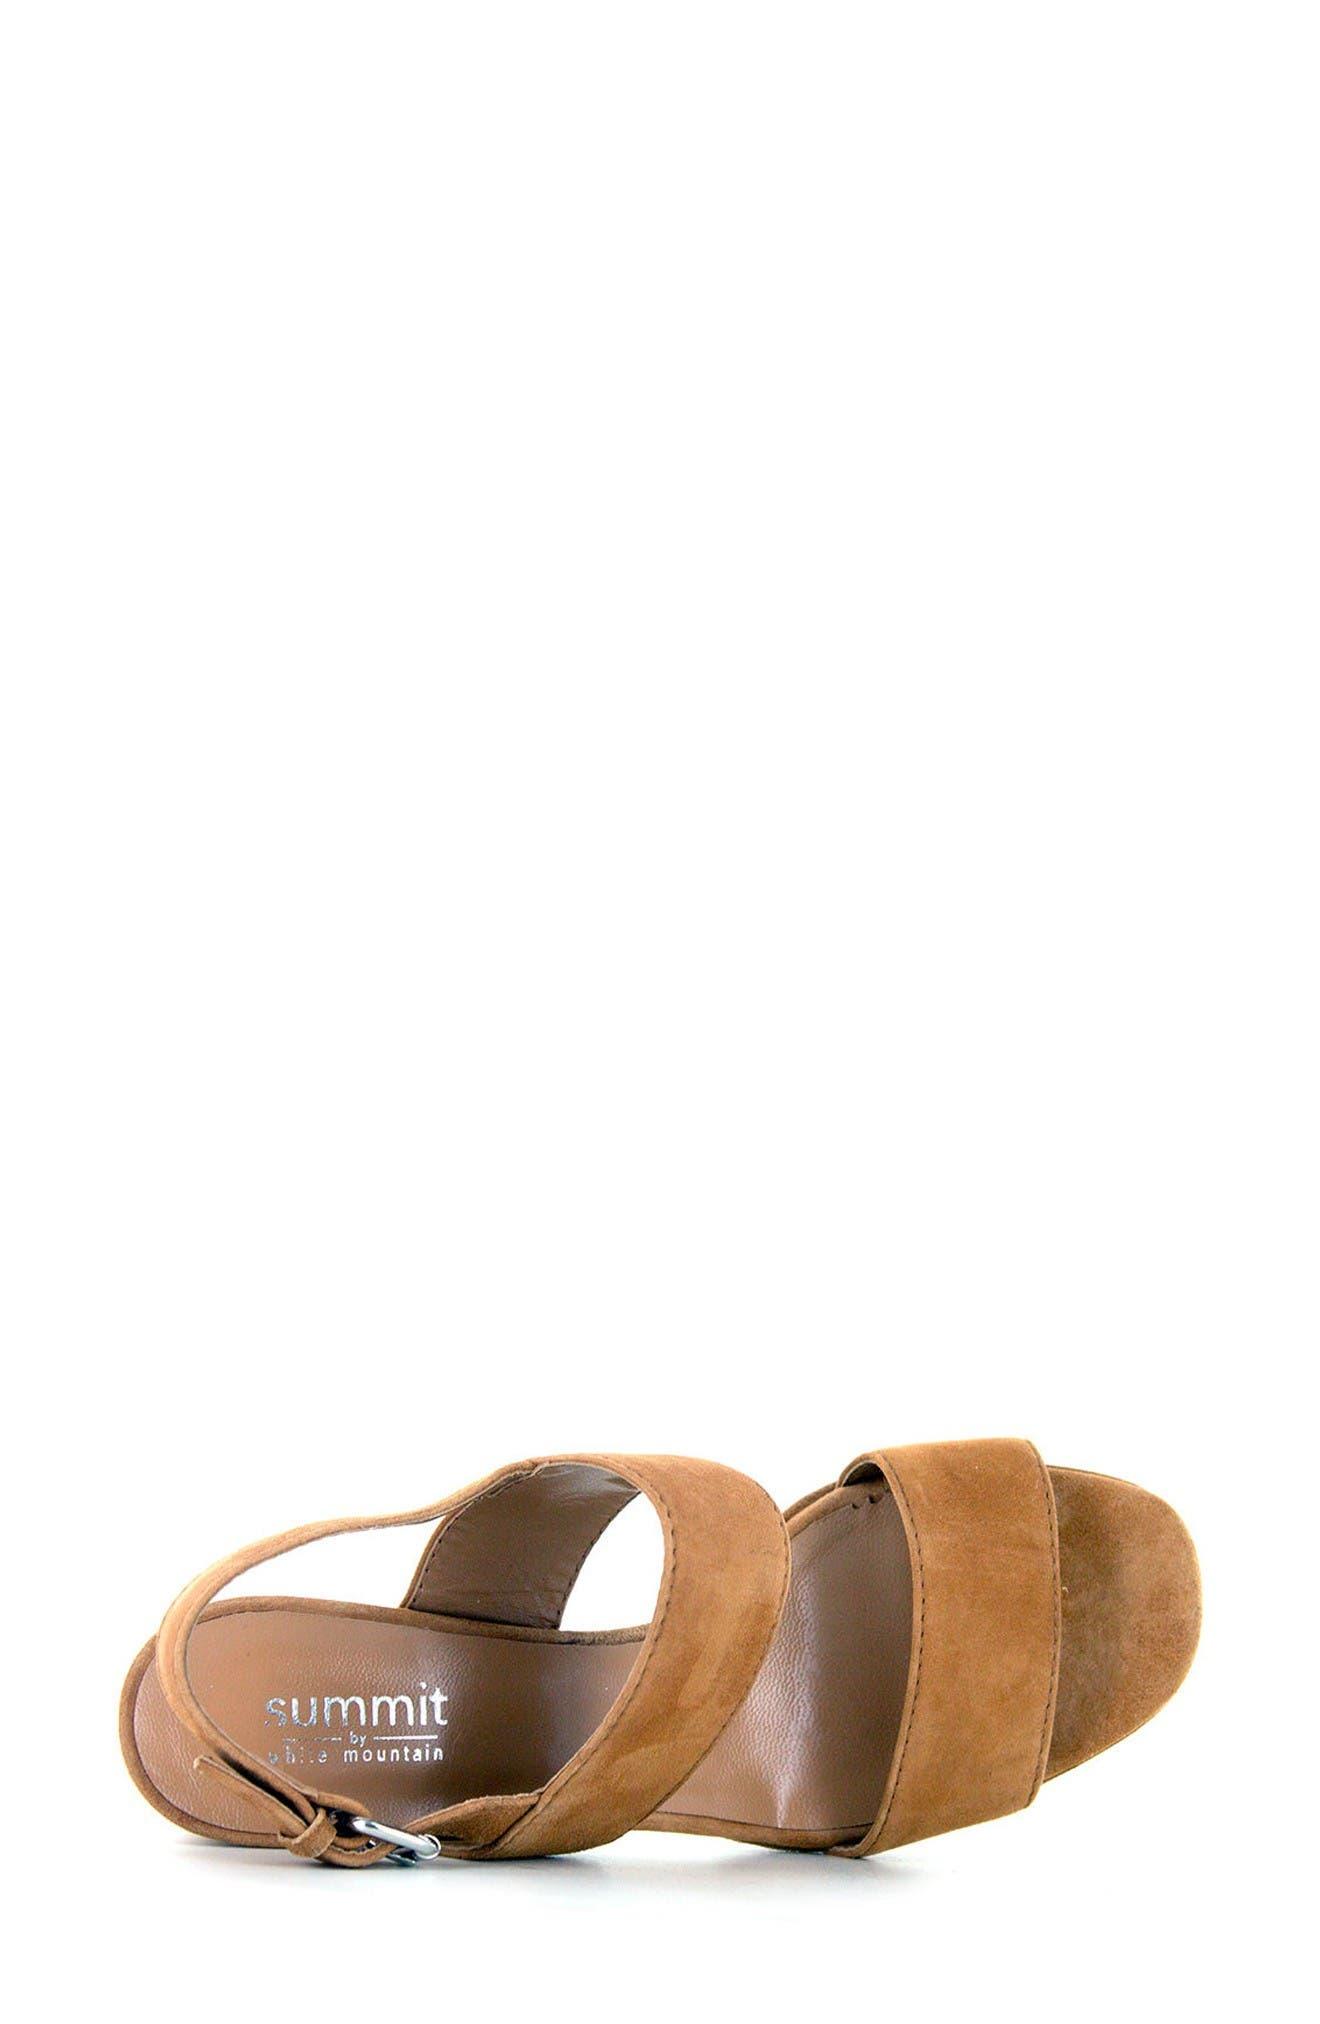 Alternate Image 3  - Summit Emilia Block Heel Sandal (Women)